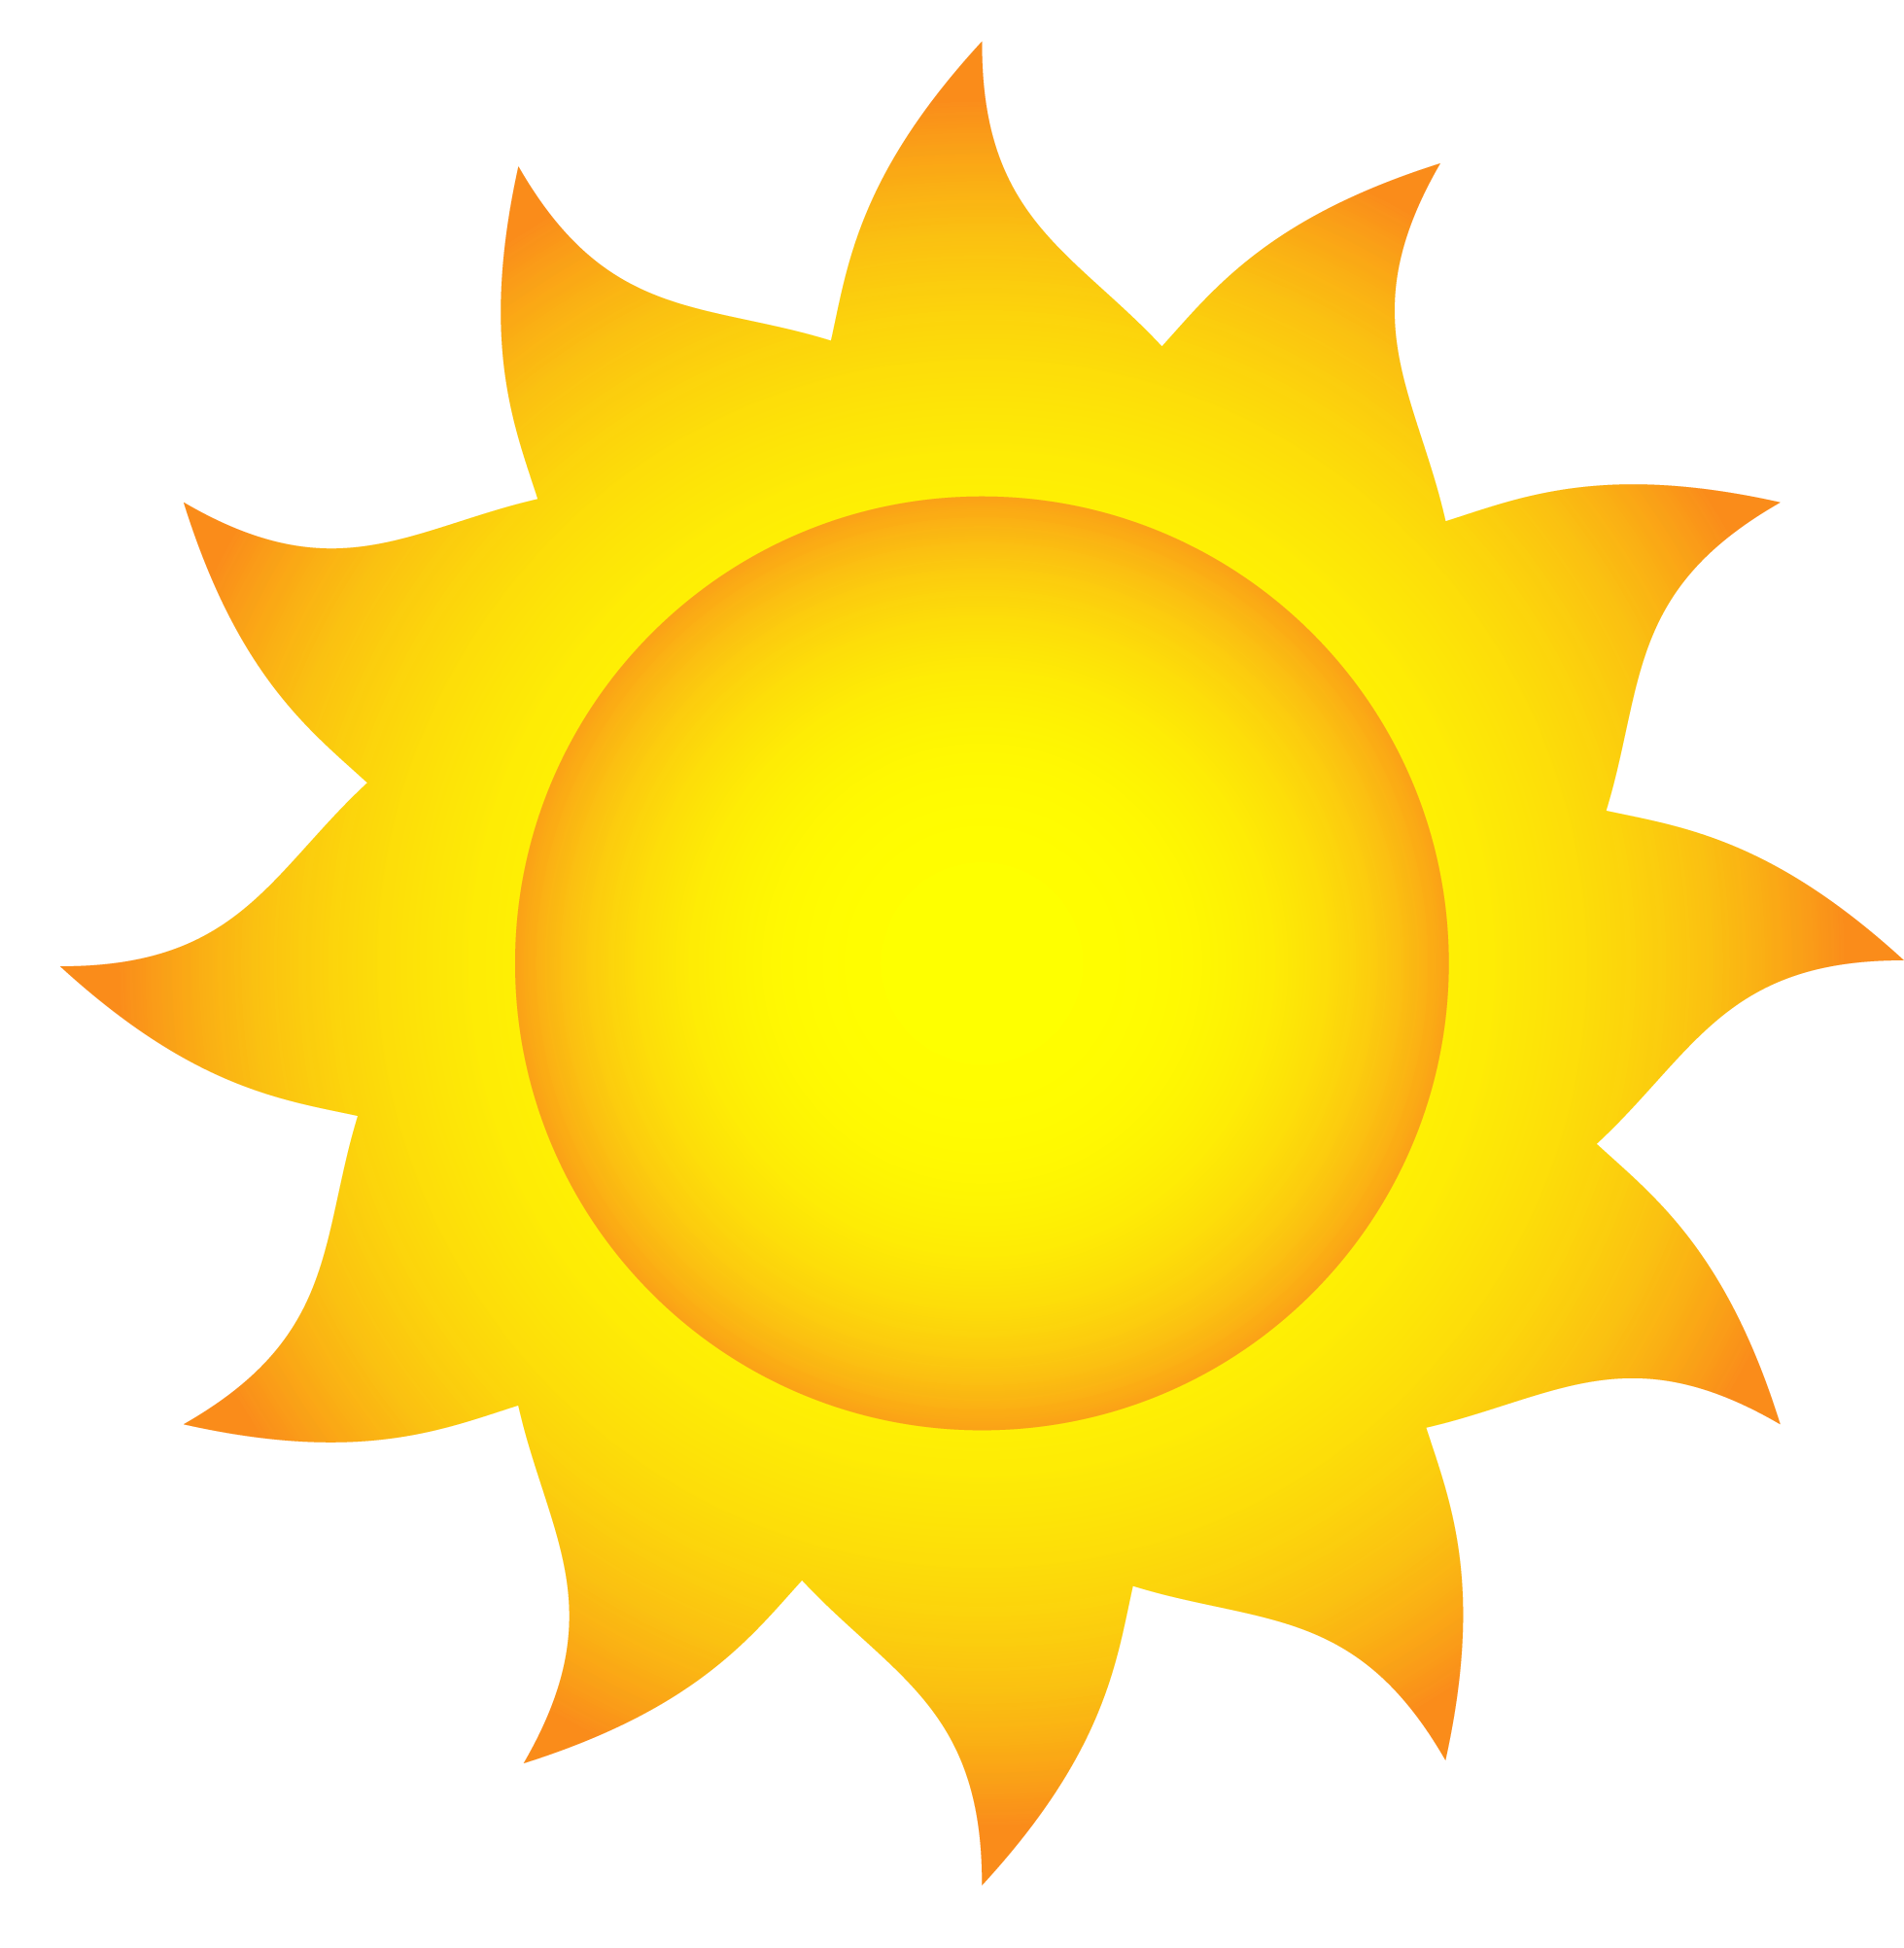 1959x2004 Sunshine Free Sun Clipart Public Domain Clip Art Images And 6 4